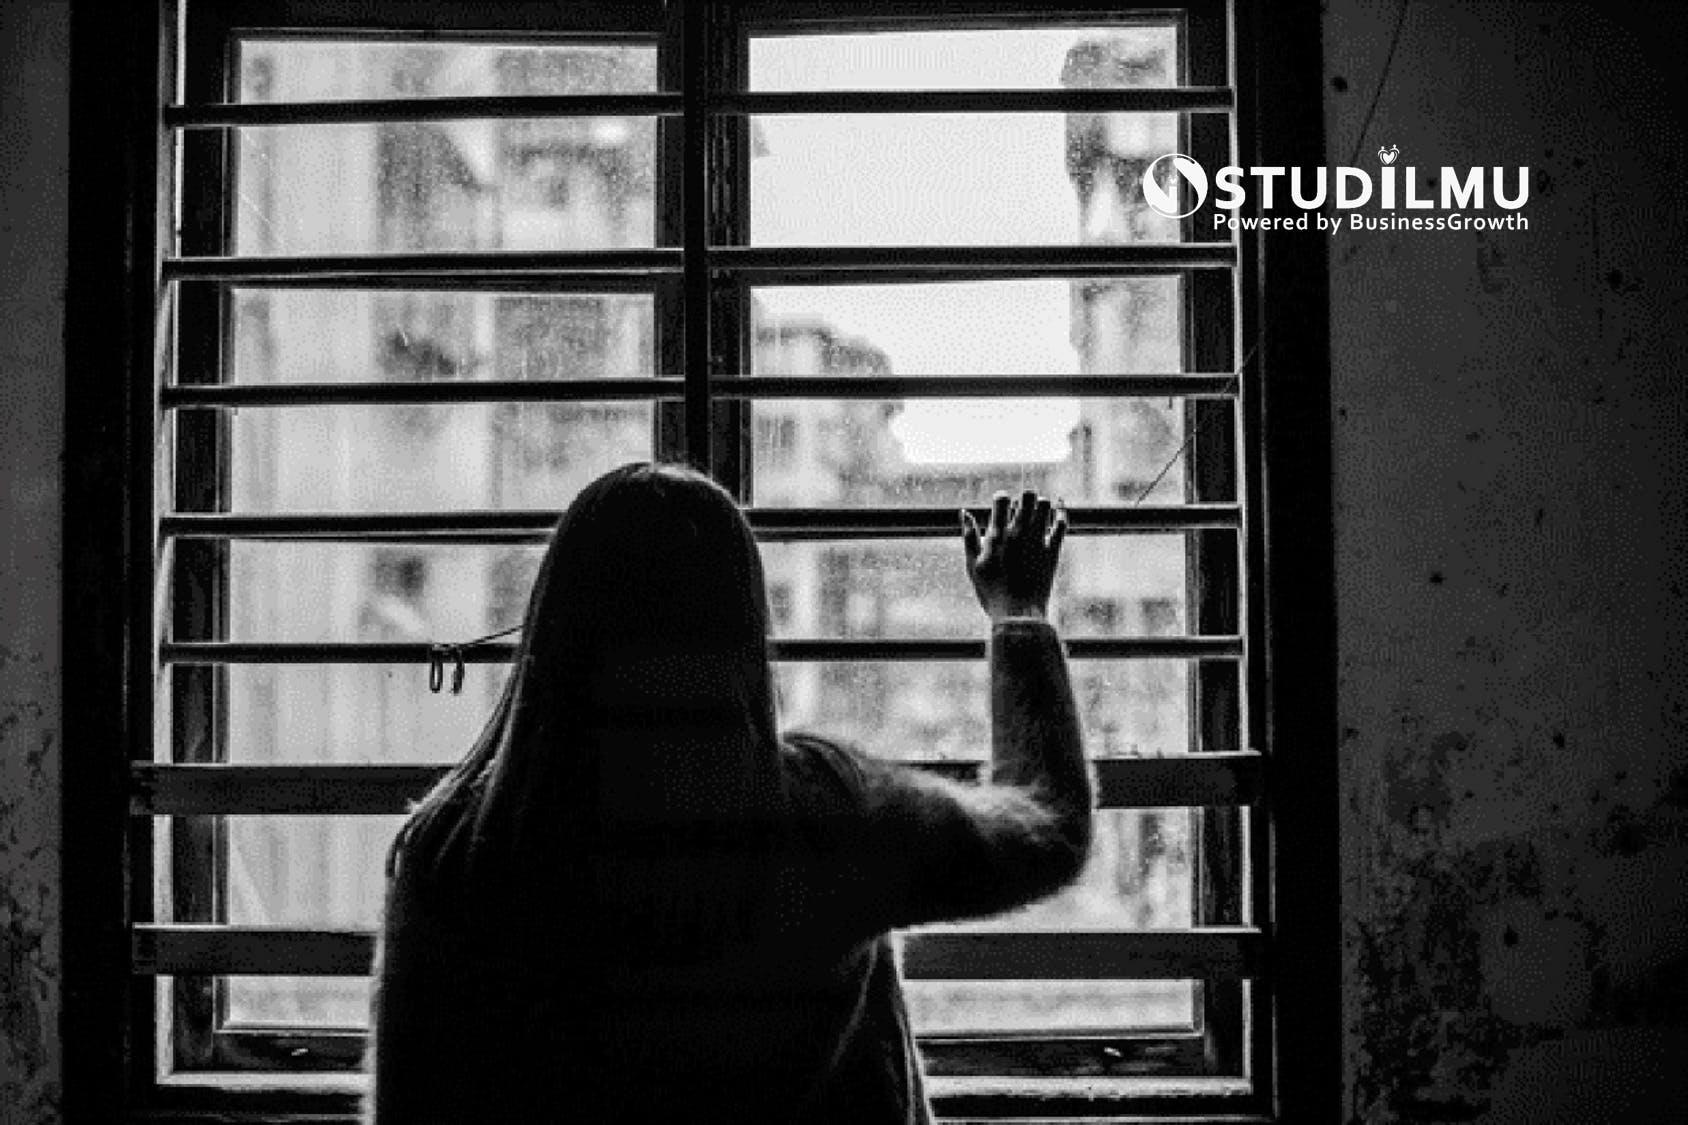 STUDILMU Career Advice - 7 Cara Menghilangkan Pikiran Negatif